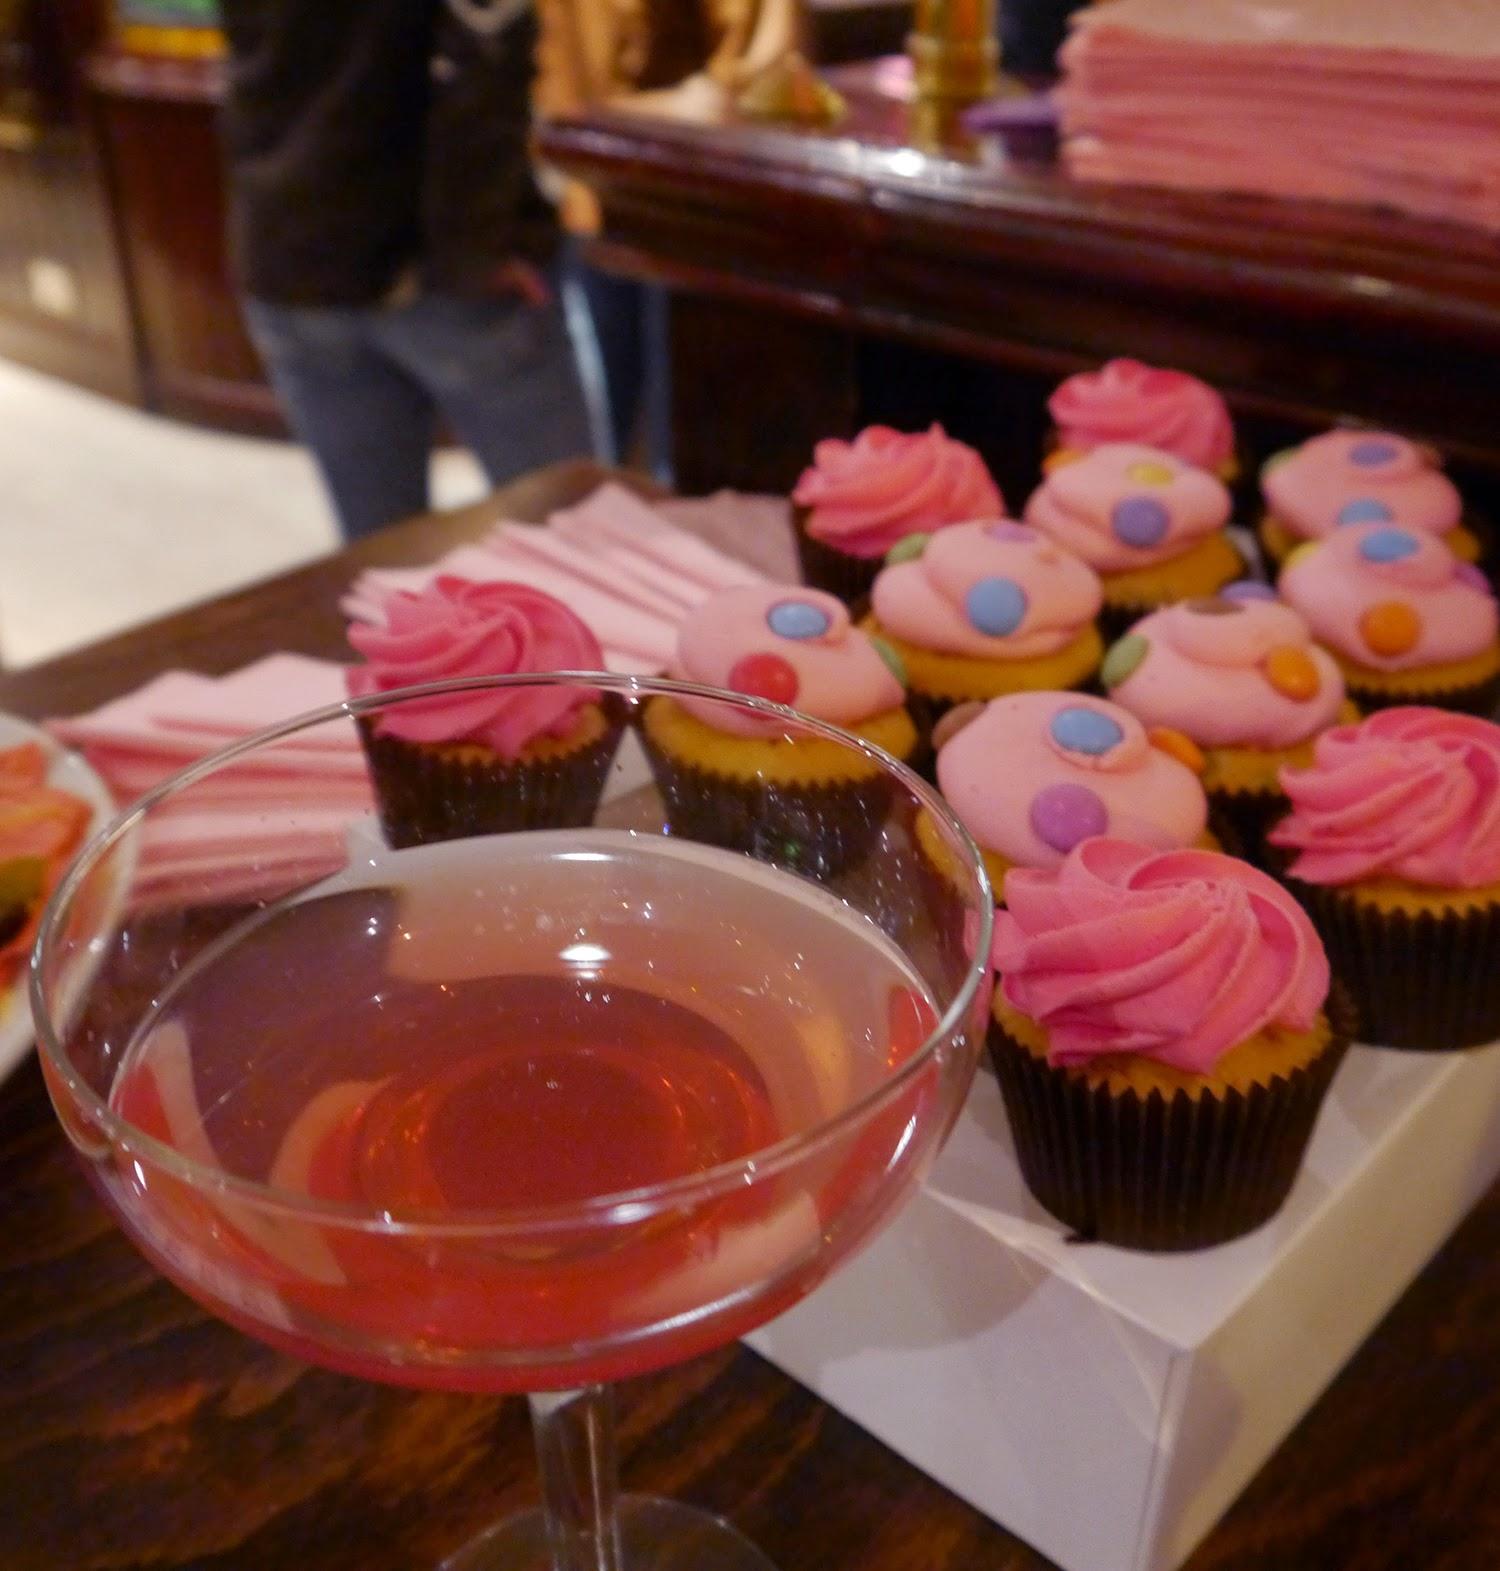 Hard Rock Cafe, Hard Rock Edinburgh, Blogger Event, Scottish Bloggers, Edinburgh bloggers, pinktober, #pinktober, Cupcakes, Bibi's bakery, pink cupcakes, cocktail